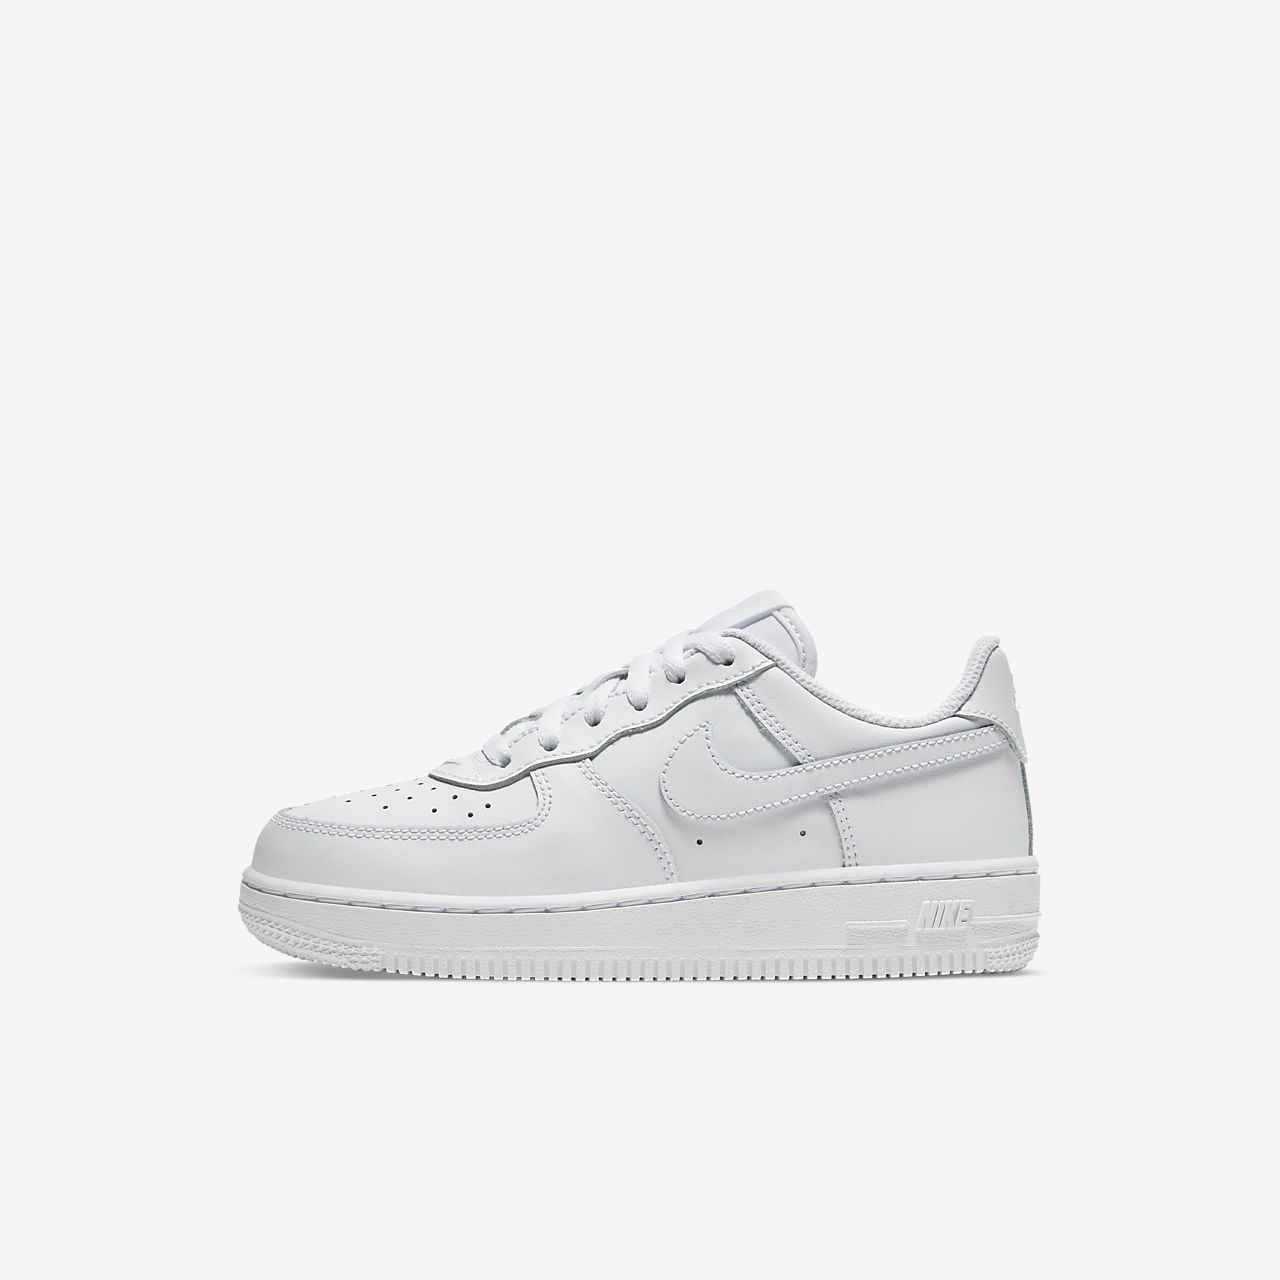 Nike Force 1 cipő gyerekeknek